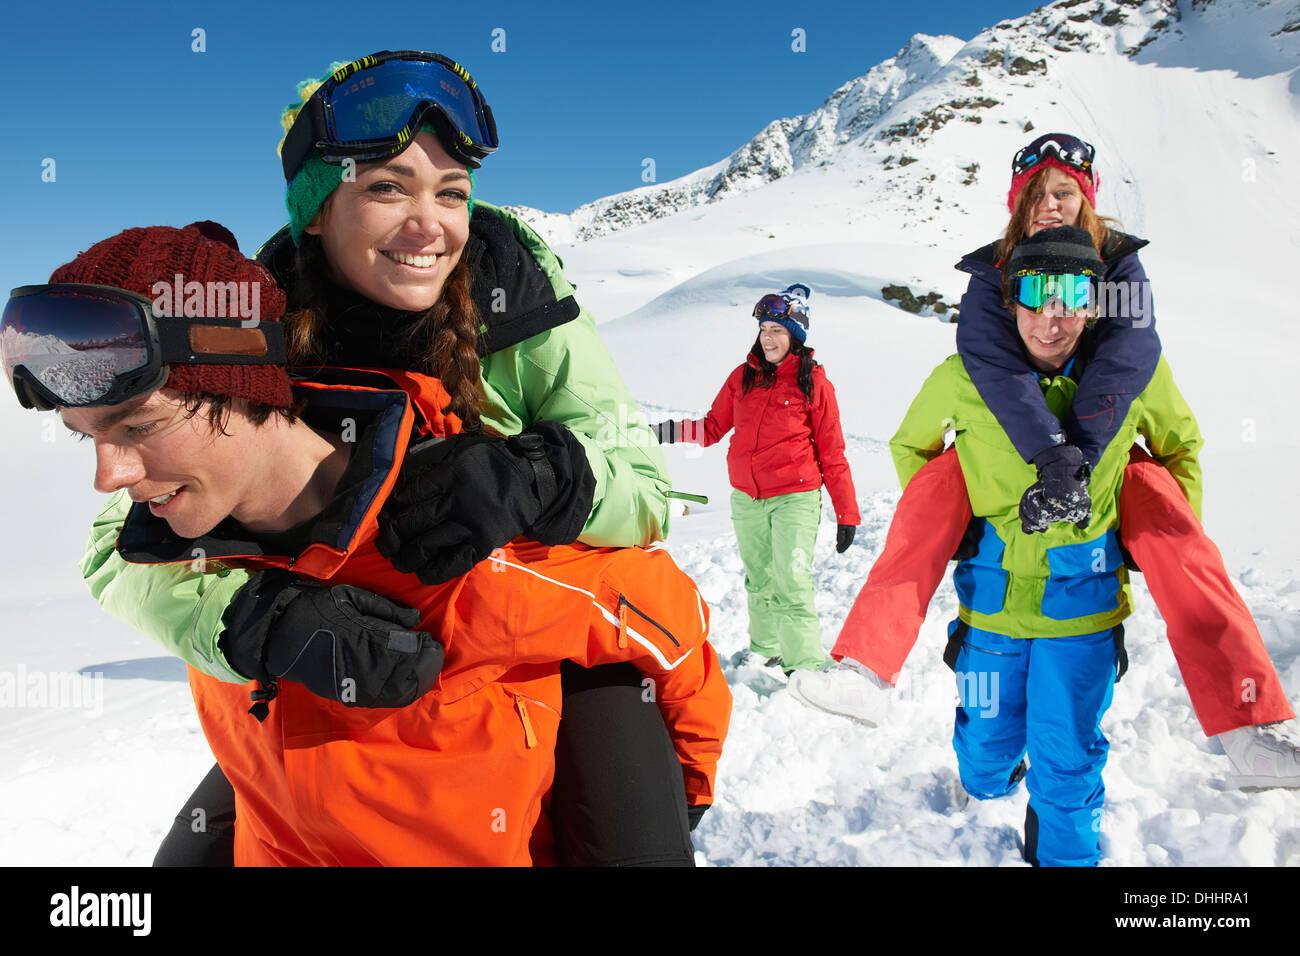 Men giving women piggy backs in snow, Kuhtai, Austria - Stock Image